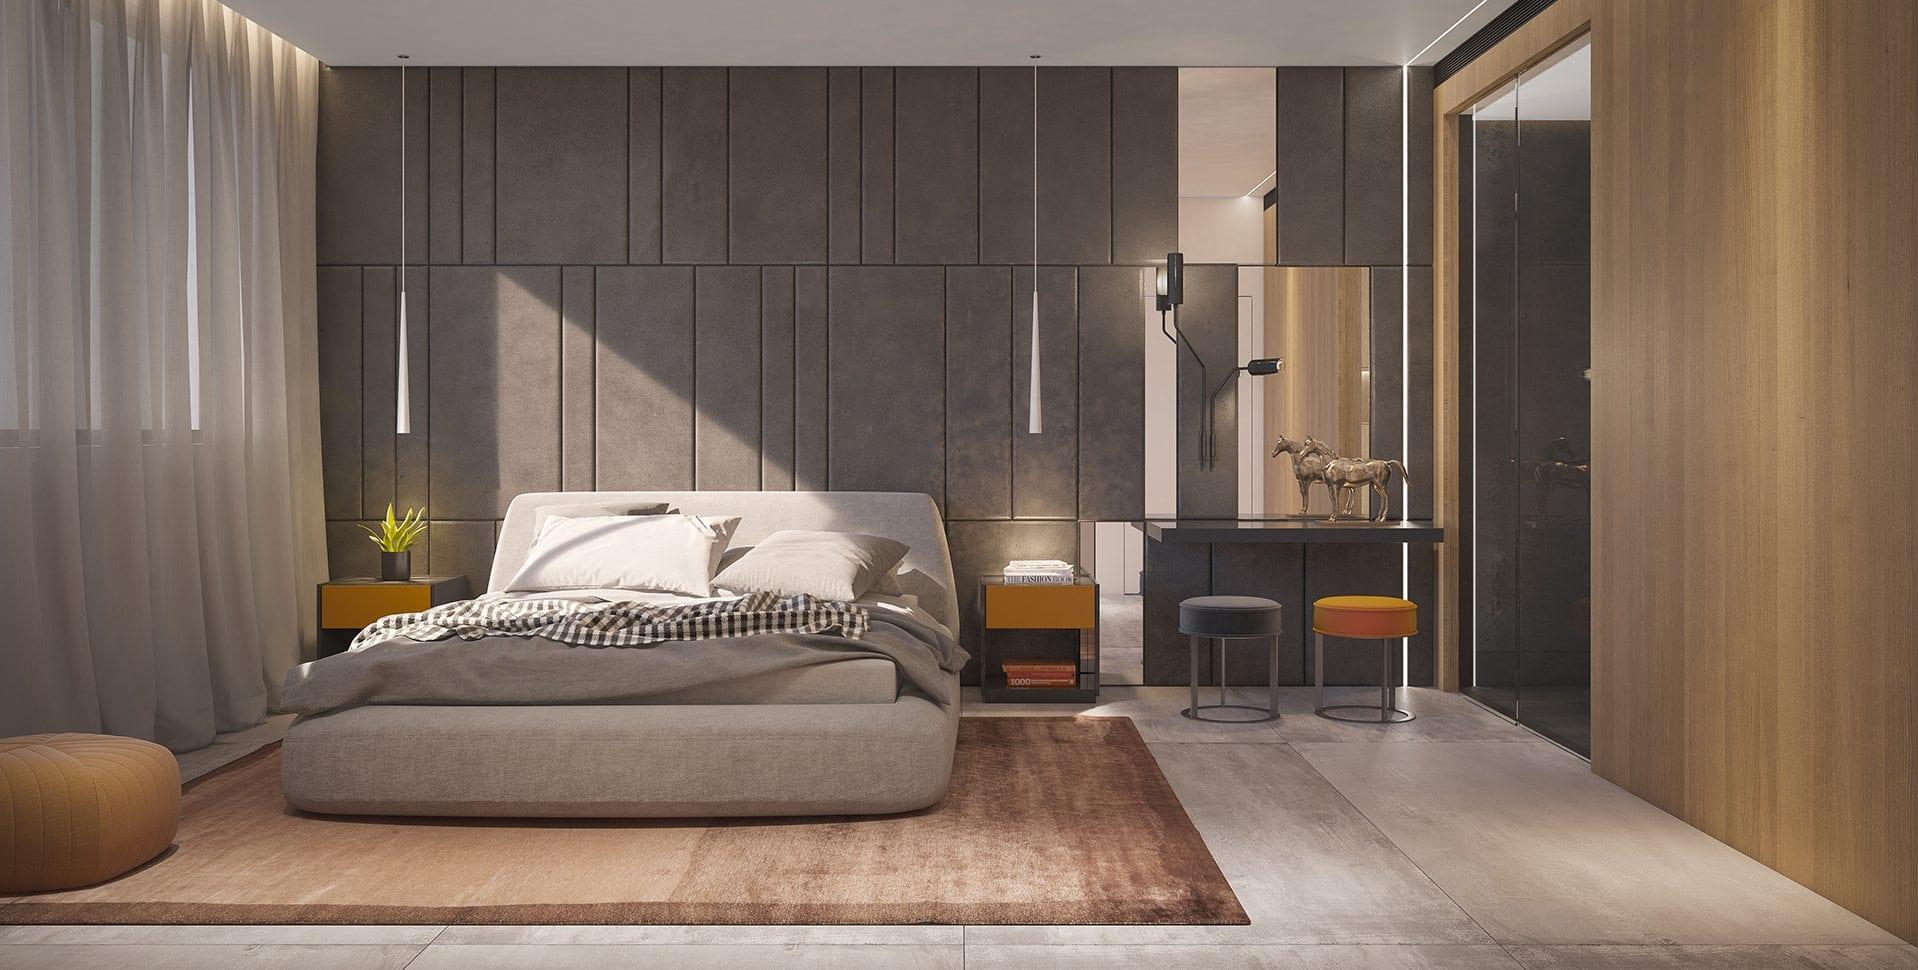 Maayan-Golan_Architectural-Visualization_ bedroom-interior-visualization_nehemia-project_ws-interior-design_03